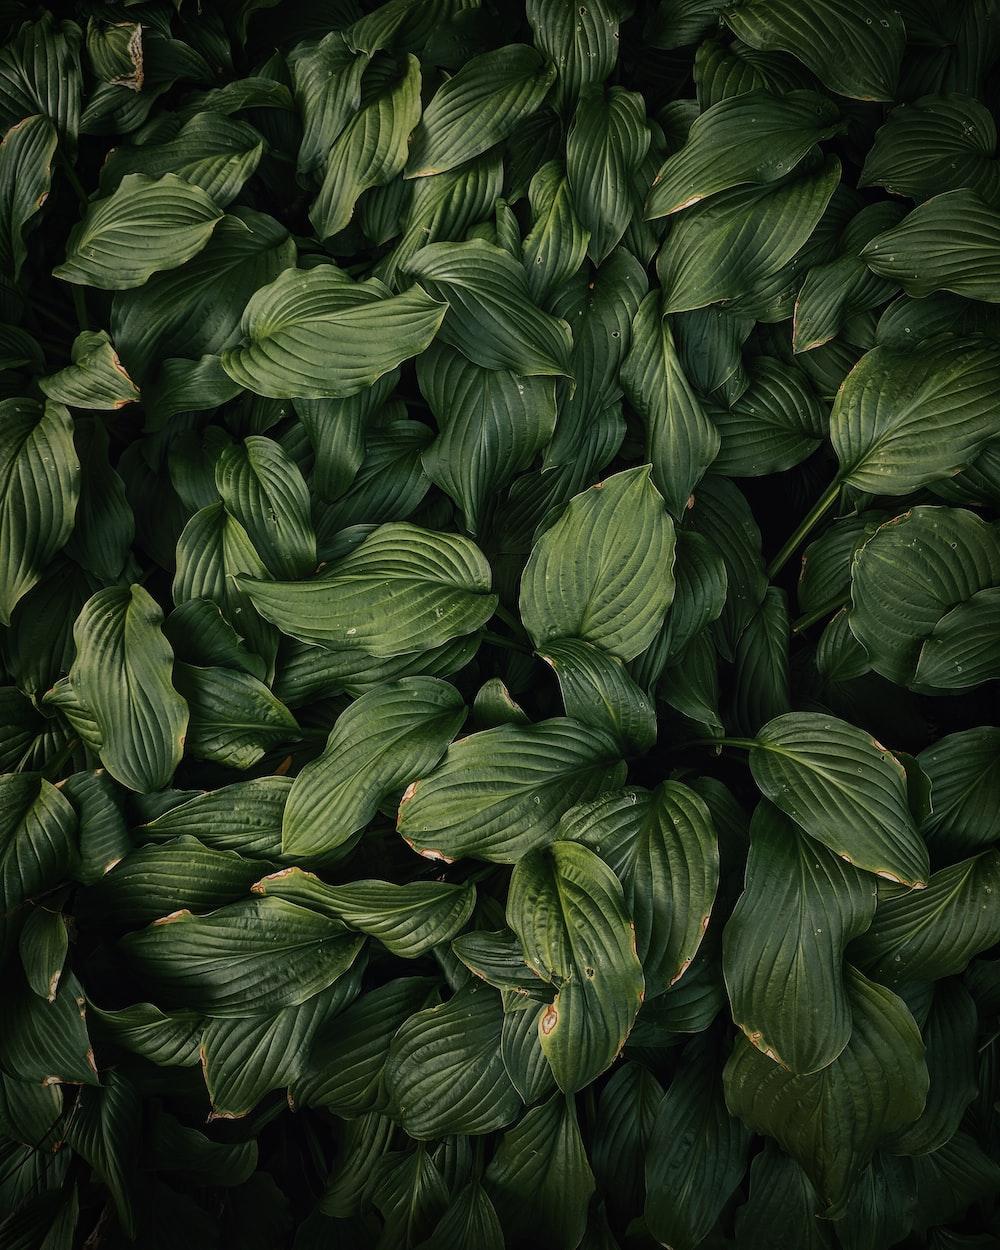 green leafed plans